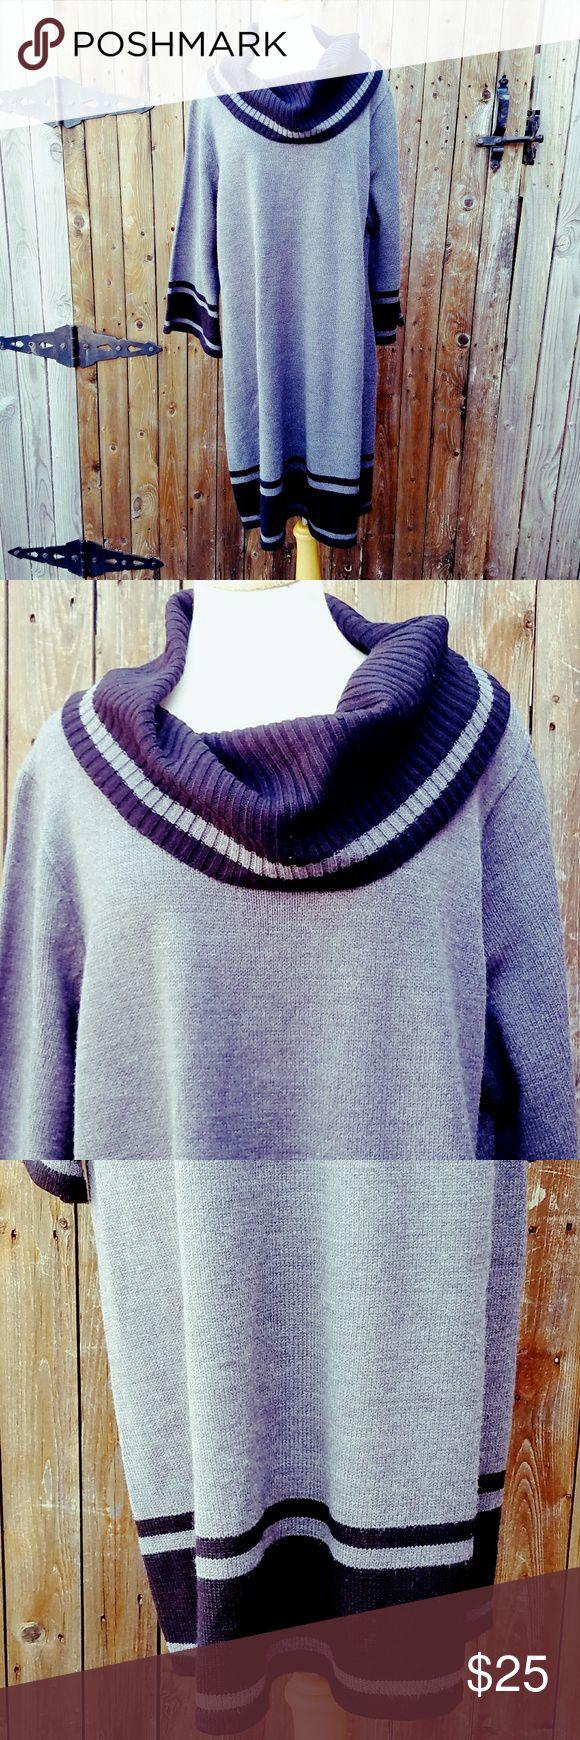 Lane Bryant Cowl Neck Sweater Dress Size 22/24W Size 22/24W Lane Bryant Dresses